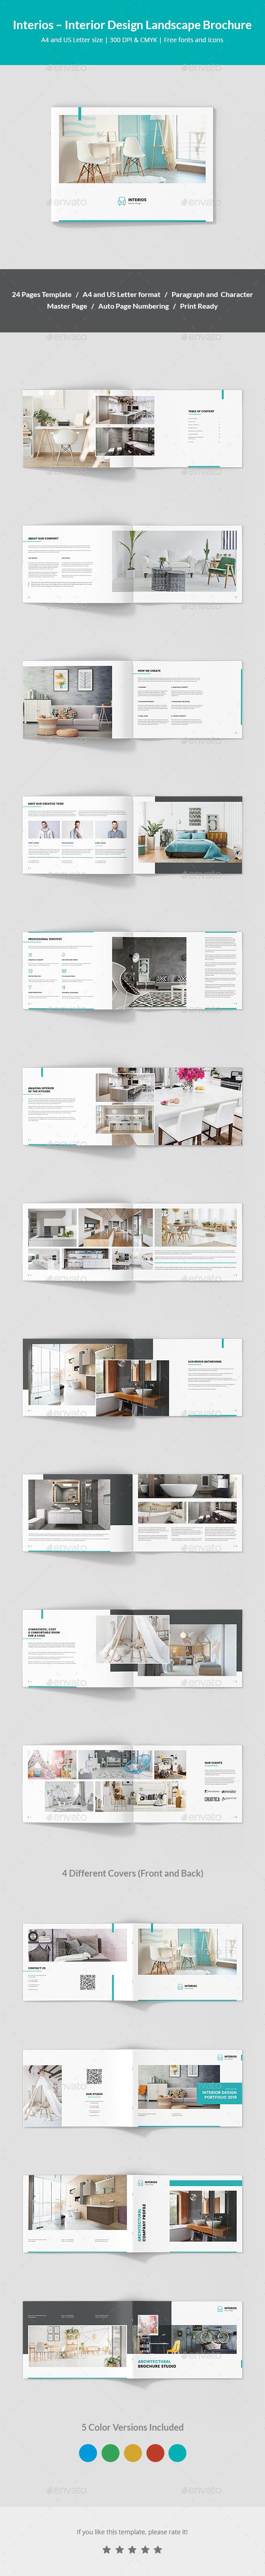 Interios – Interior Design Landscape Brochure - Corporate Brochures